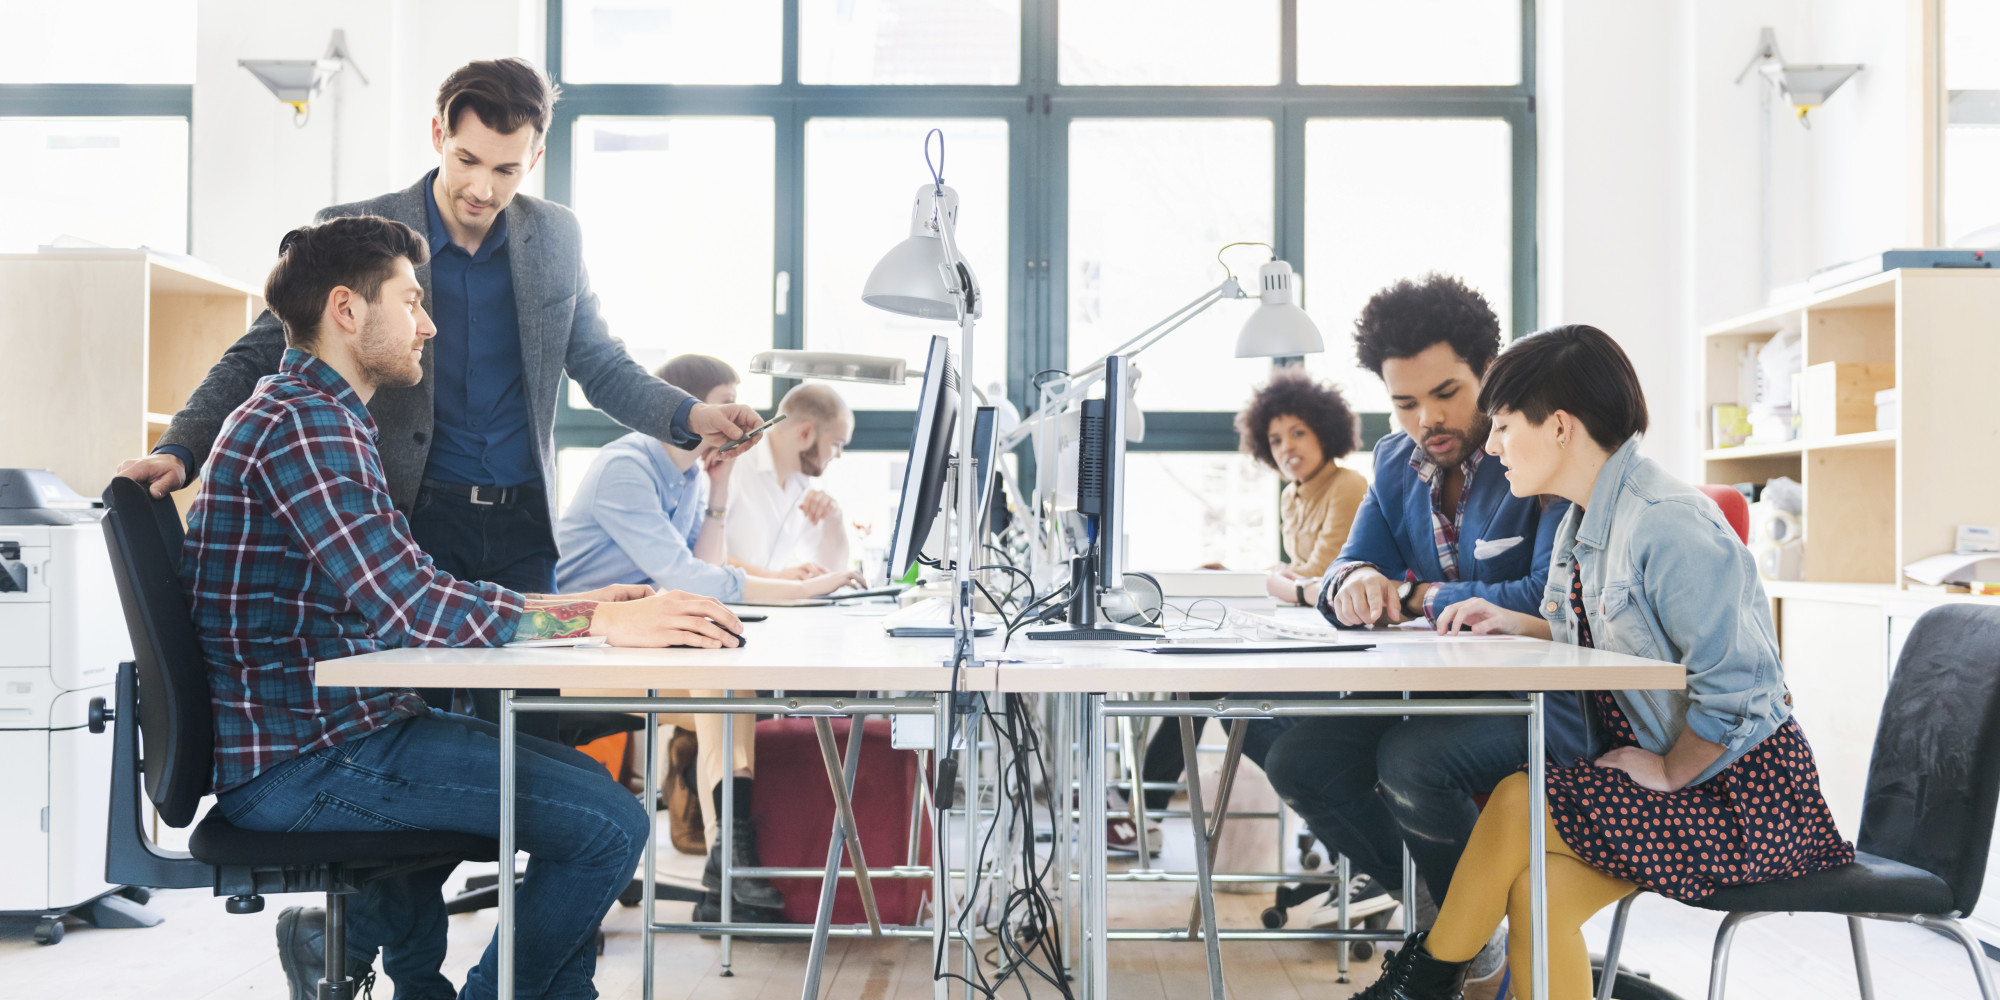 Pomysł na Twój udany StartUp